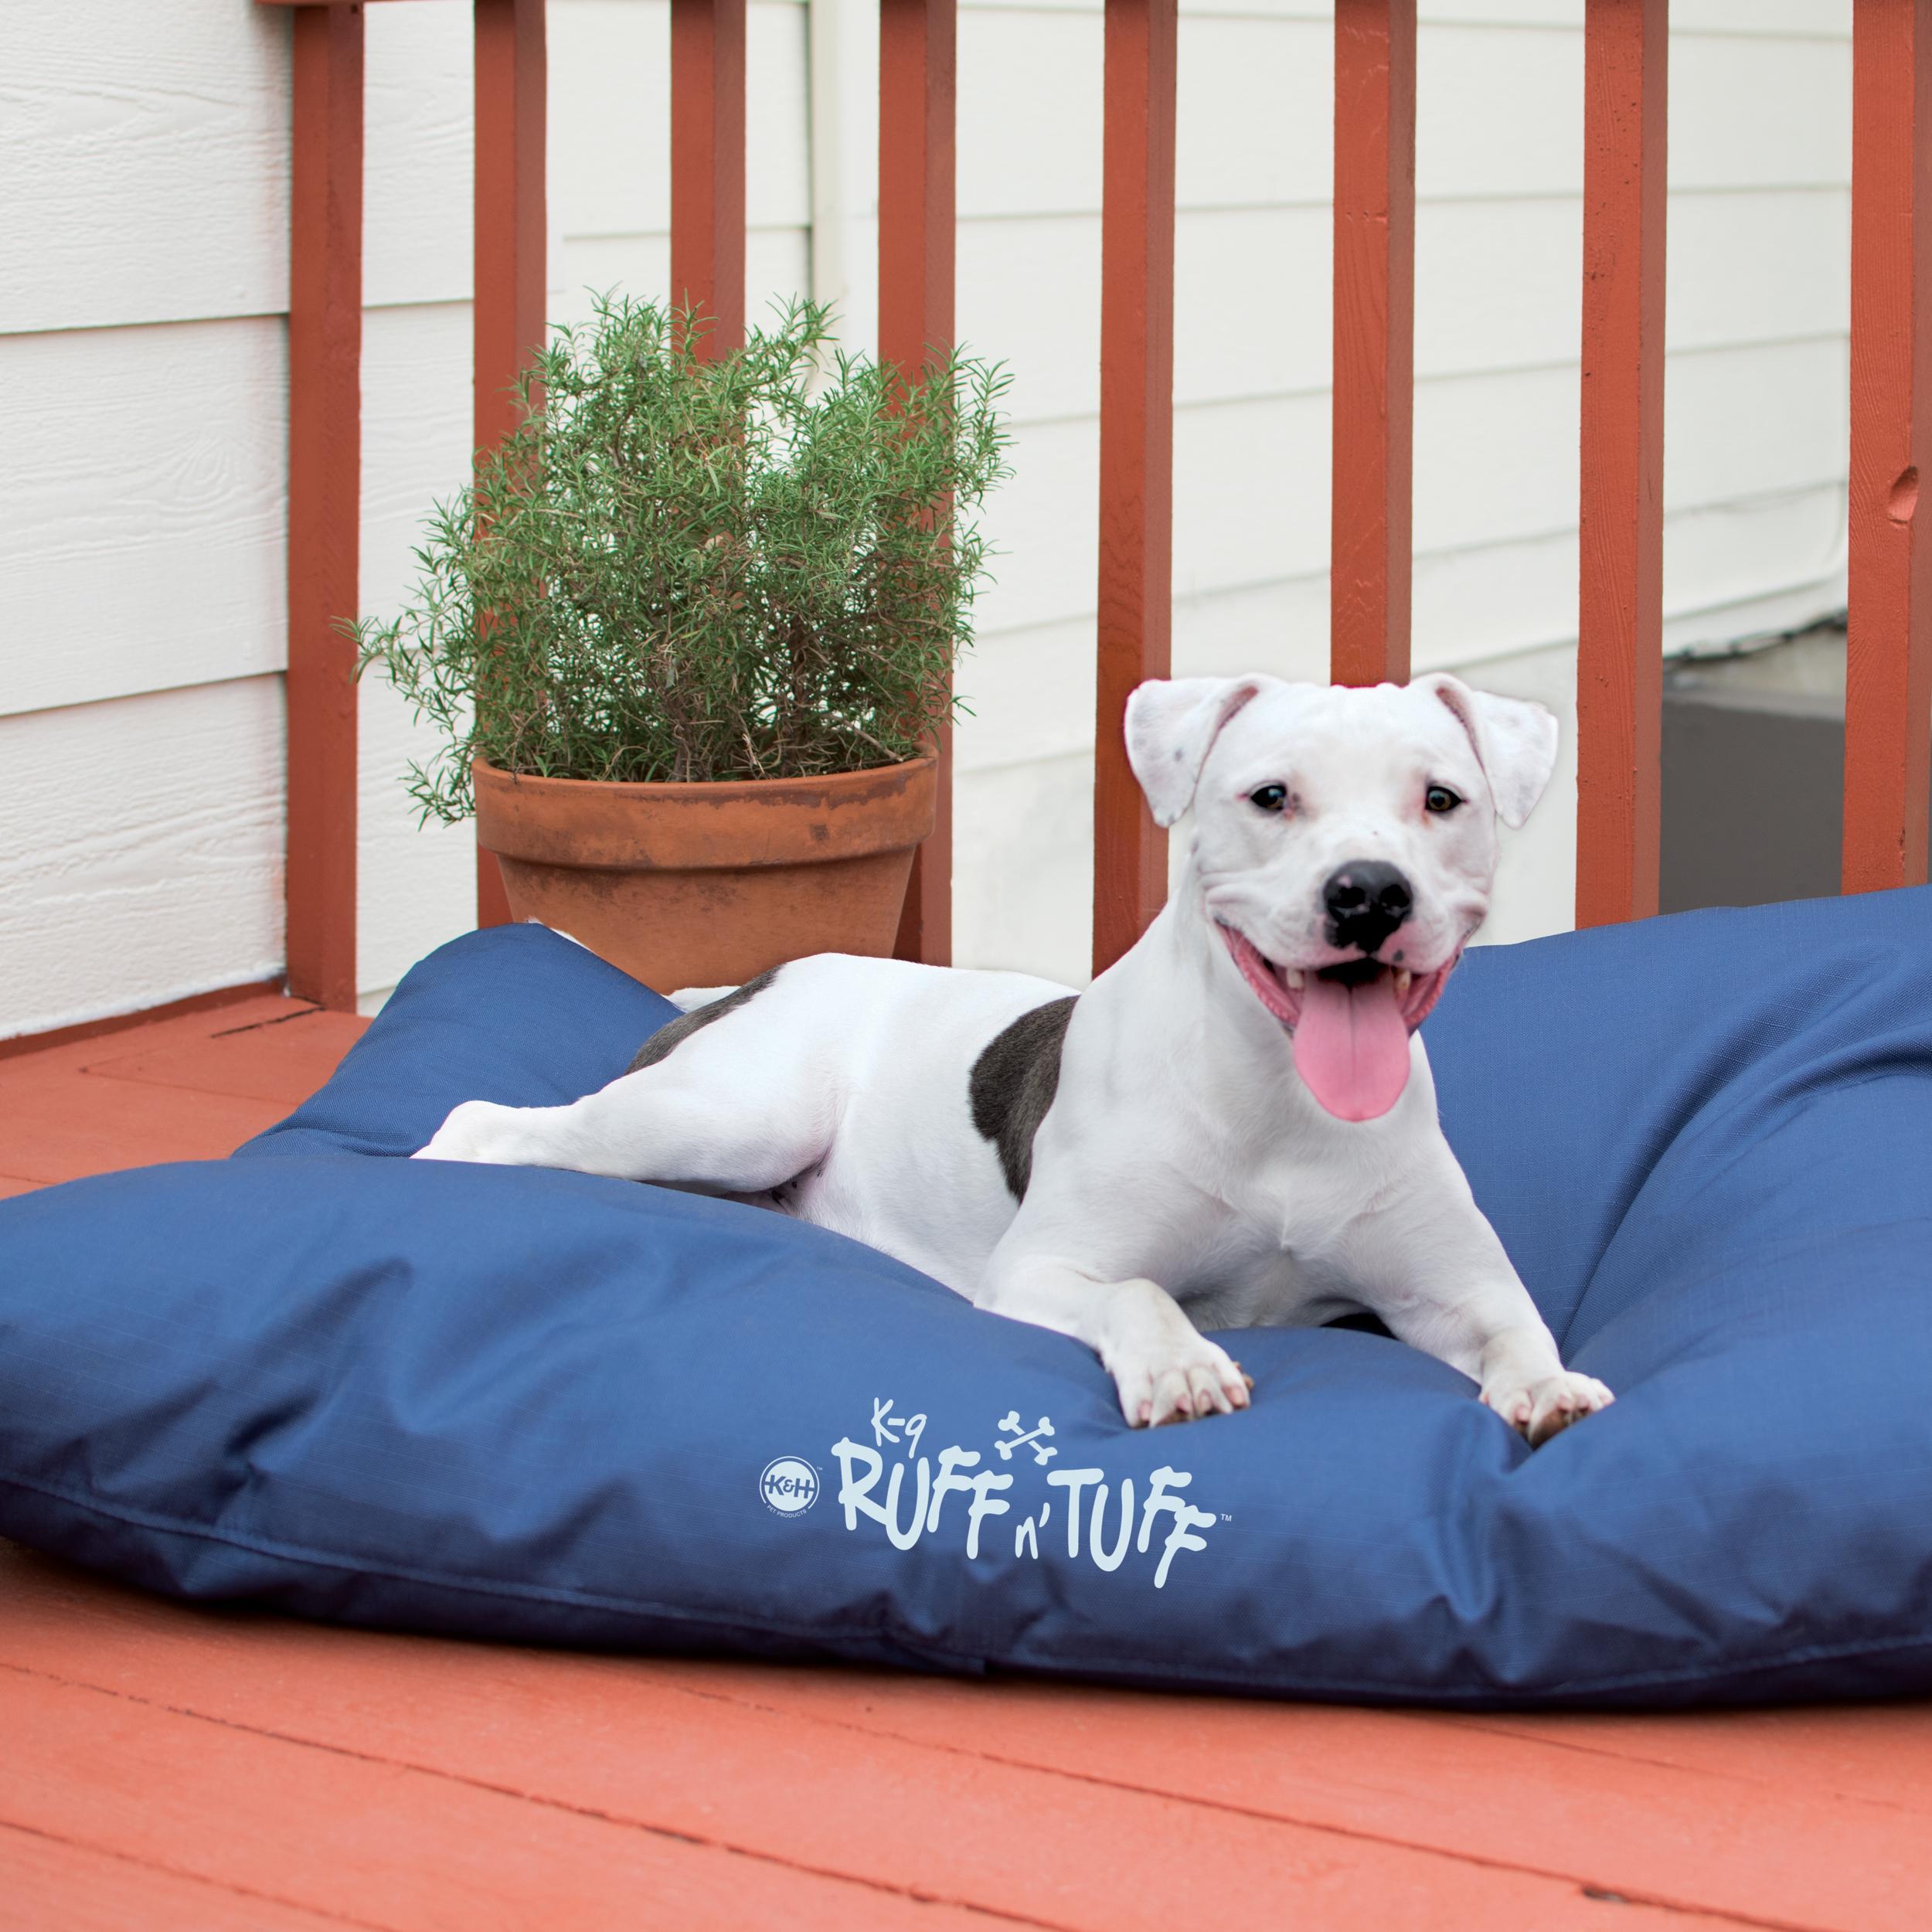 Amazon.com : K&H Pet Products K-9 Ruff n' Tuff Pet Bed